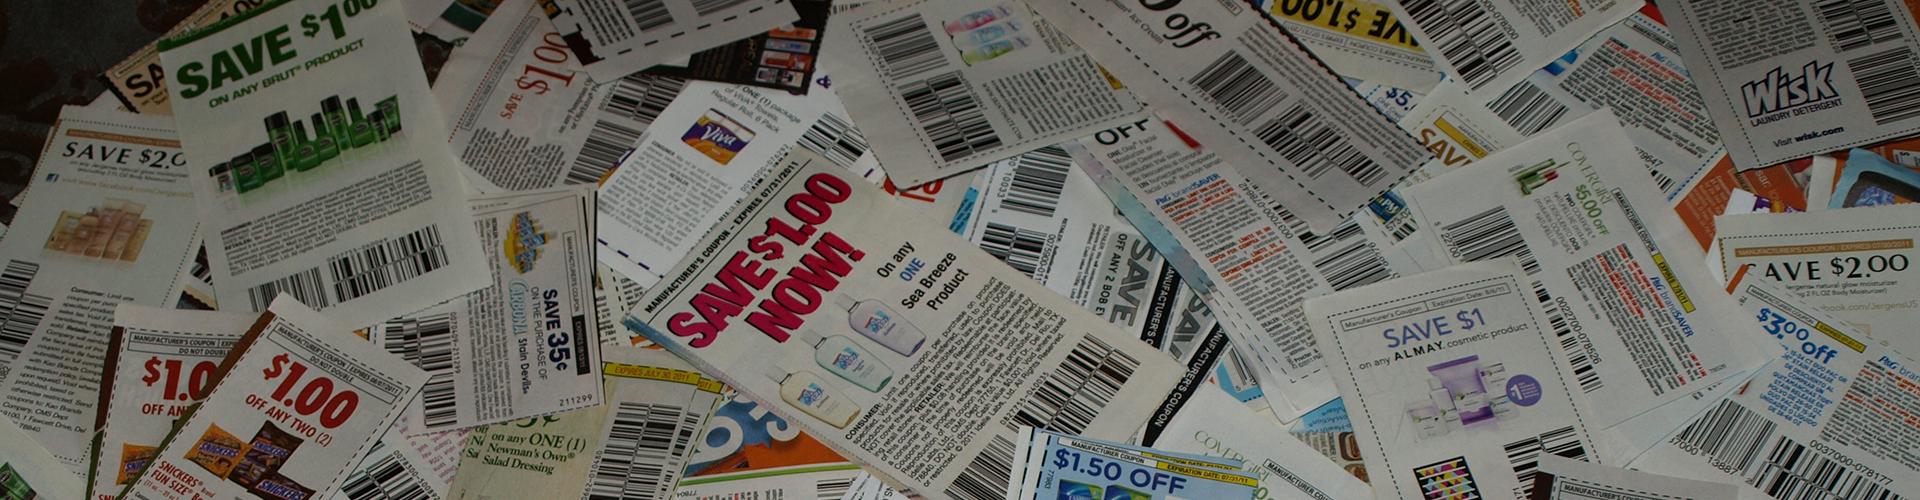 plumbing coupons discounts denver